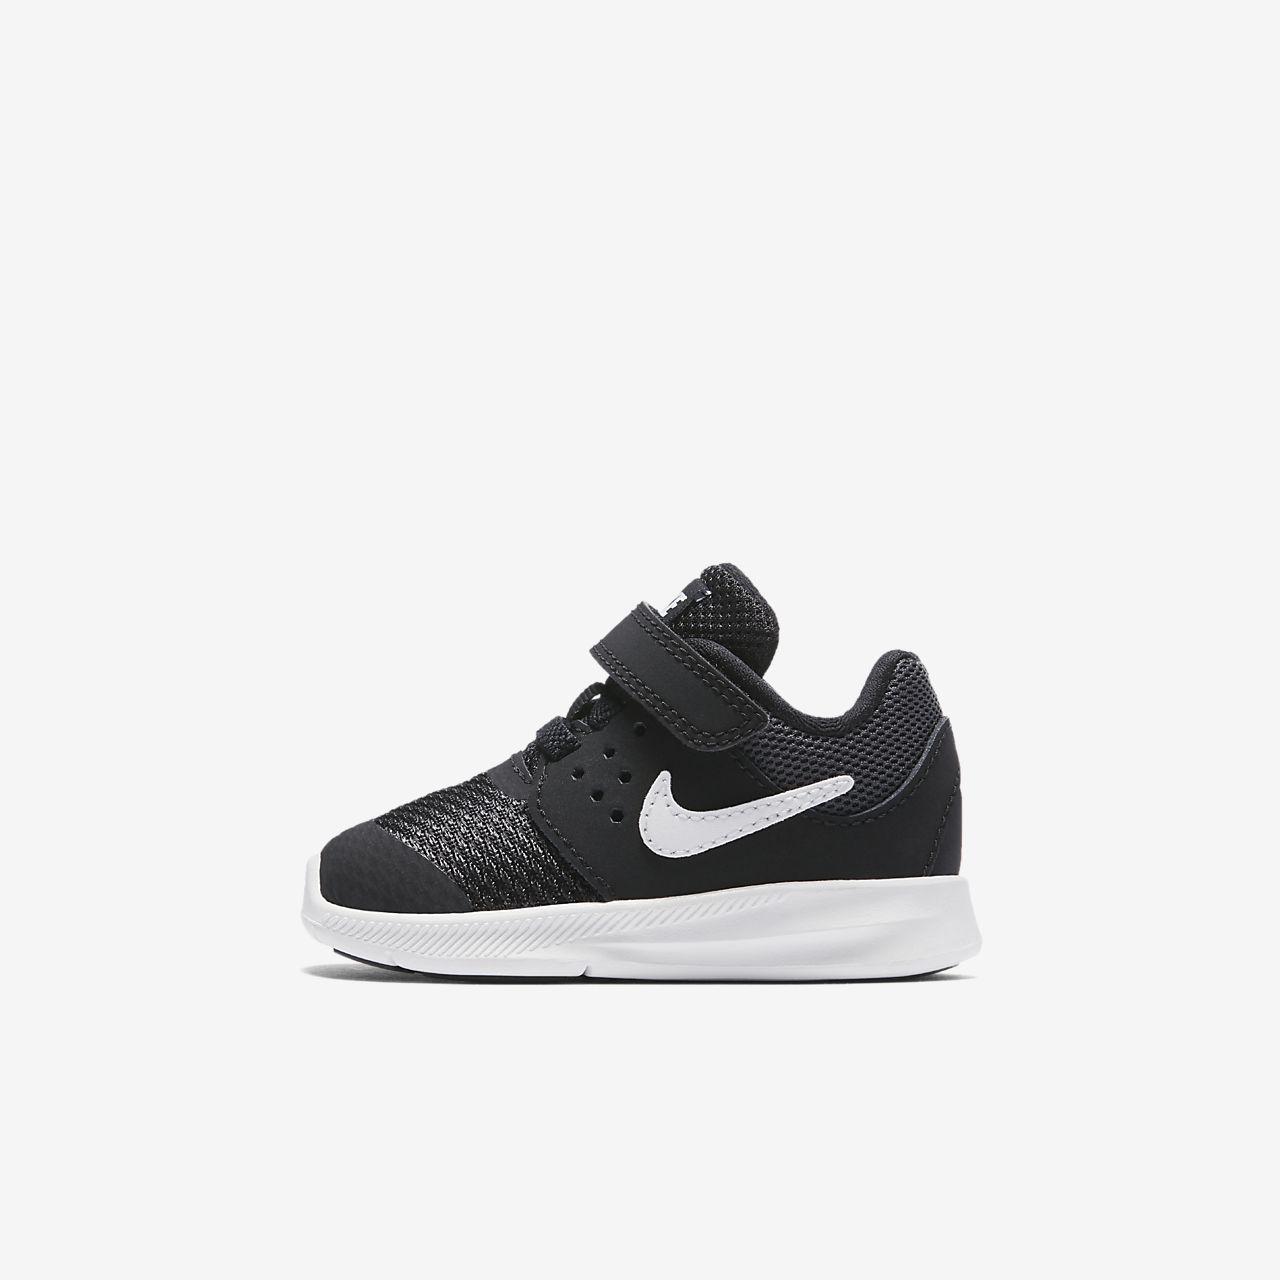 Downshifter Shoe Nike Toddler 7 Babyamp; YHWED29I